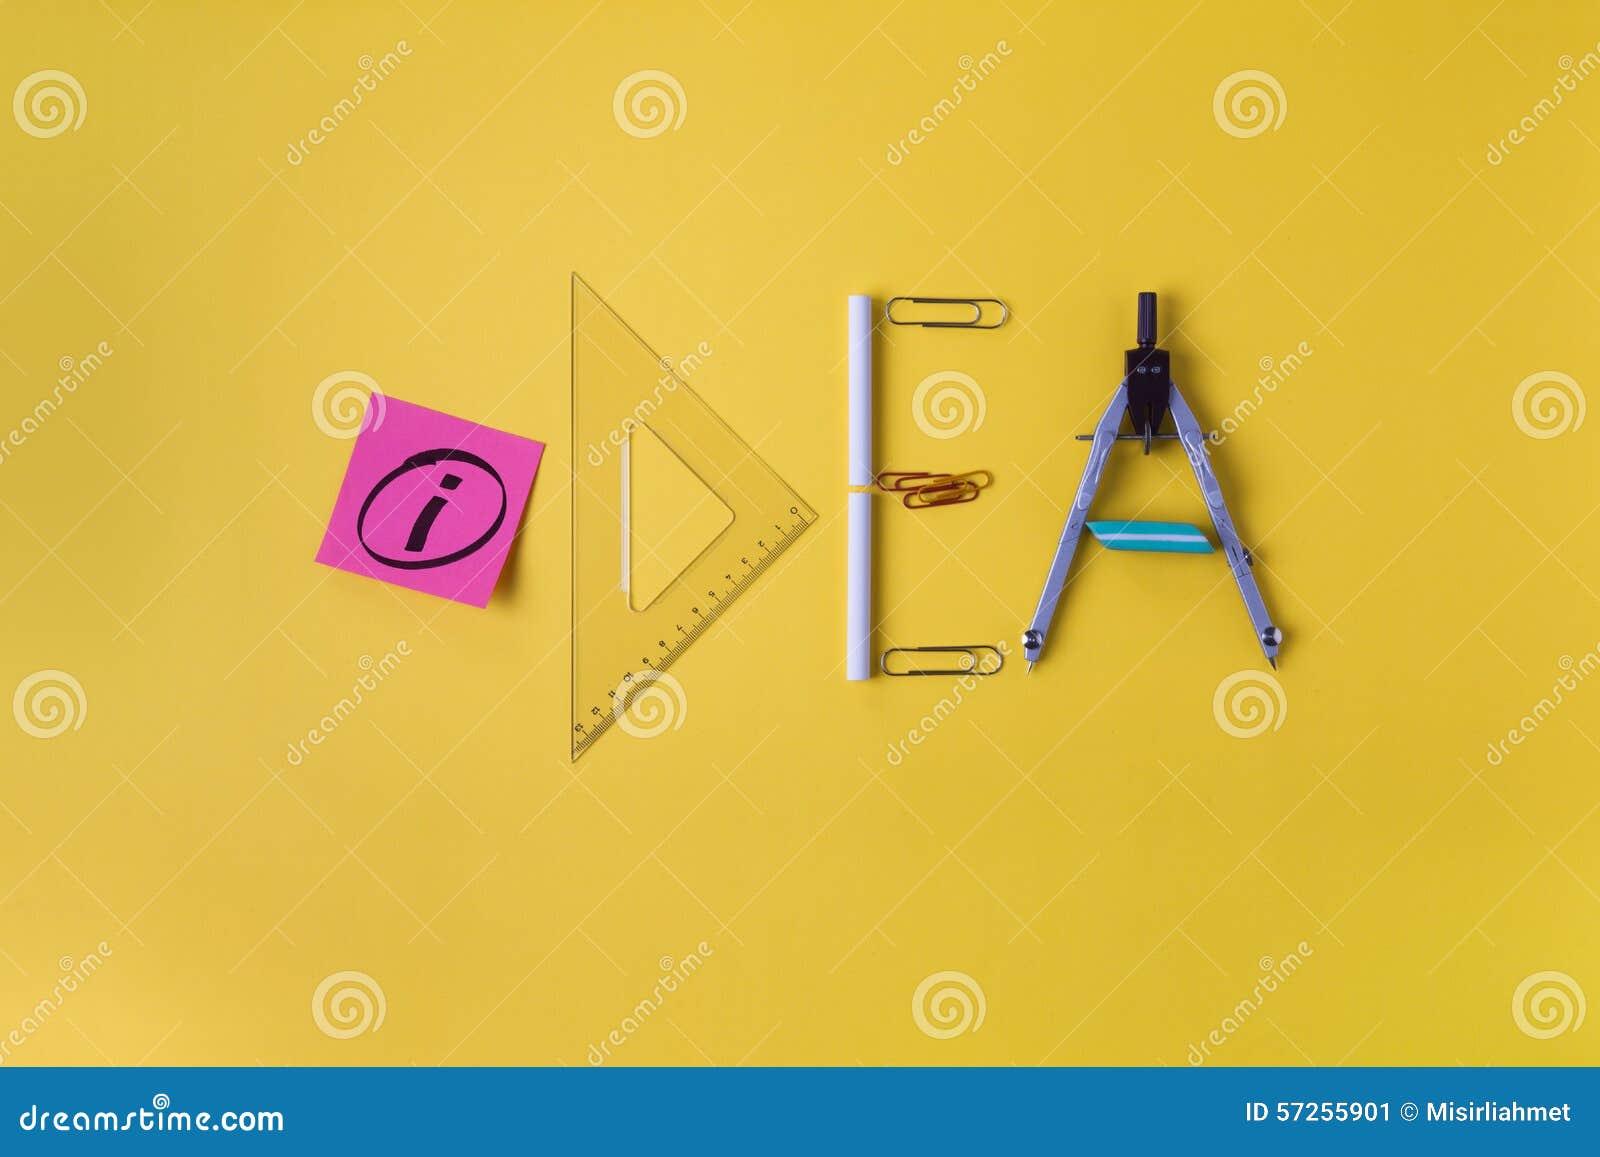 idea office supplies. Royalty-Free Stock Photo Idea Office Supplies N